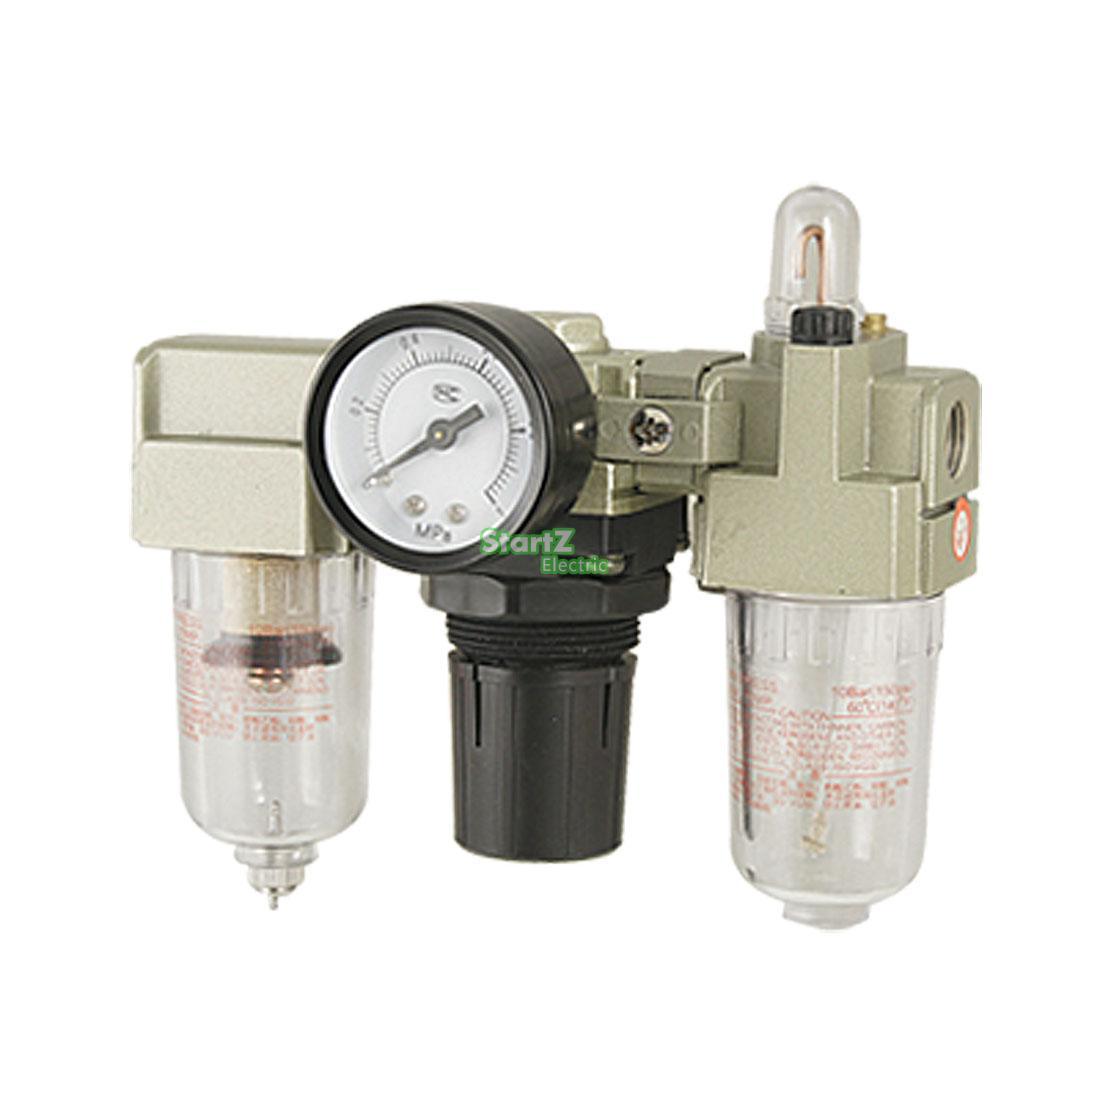 G1//4 Air Filter Pressure Regulator,Air Source Gas Treatment Unit Oil Water Separator for Pneumatic System,AC2000-02 Miniature Combo Moisture Trap Piggyback Compressed Air Filter Regulator